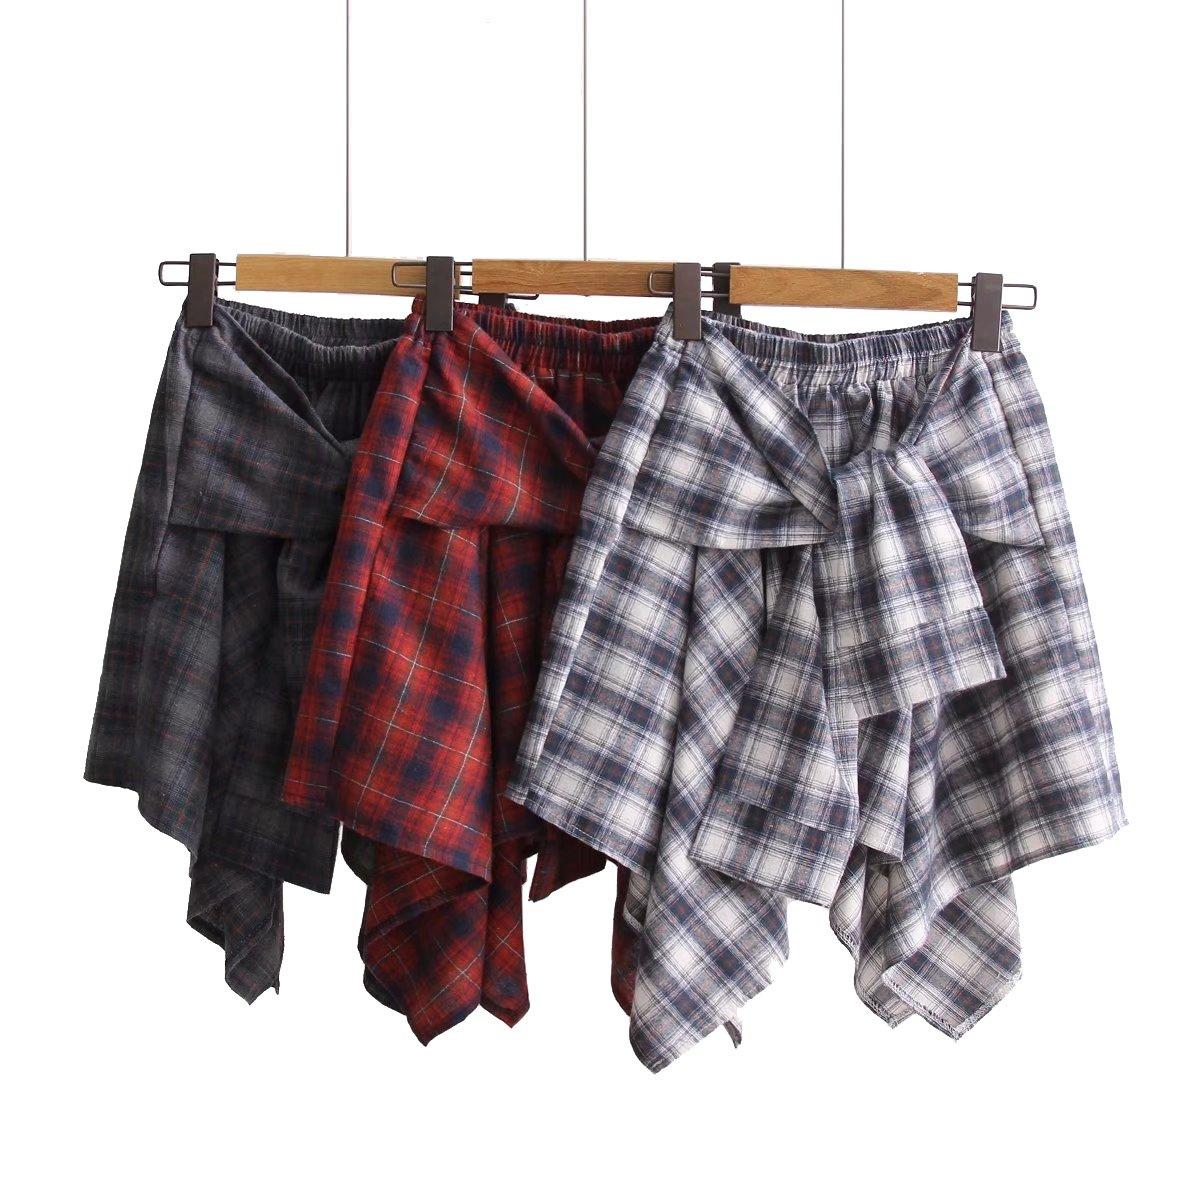 c6028e3b13a2f MolVee Women's Elastic Waist Plaid School Skirt Casual Skater Skirt